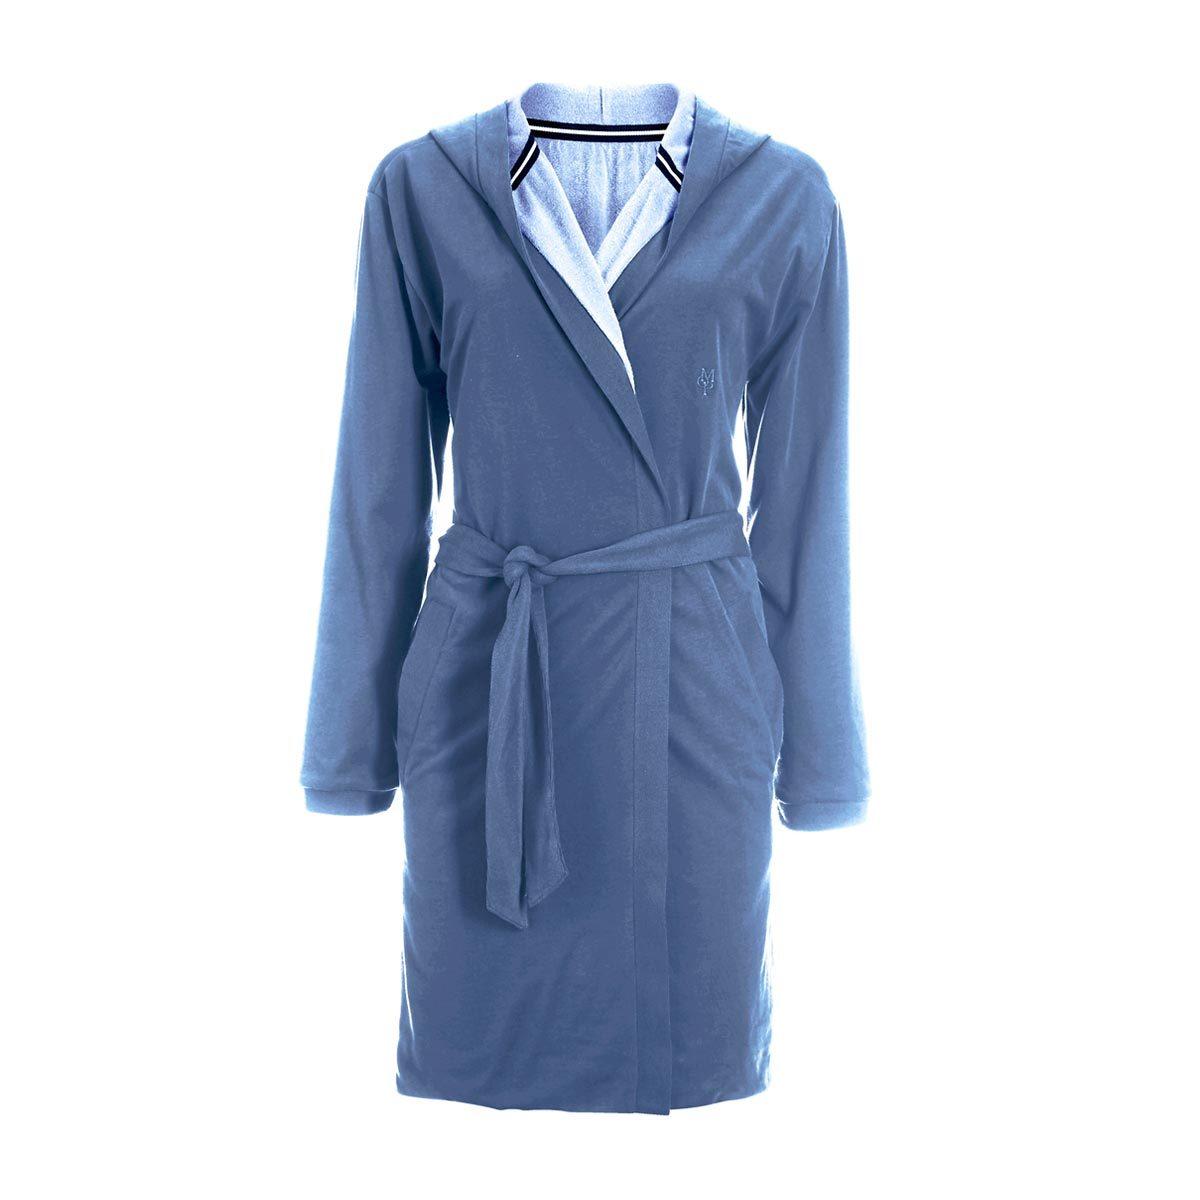 marc o polo damen bademantel fima blue lilac g nstig online kaufen bei bettwaren shop. Black Bedroom Furniture Sets. Home Design Ideas